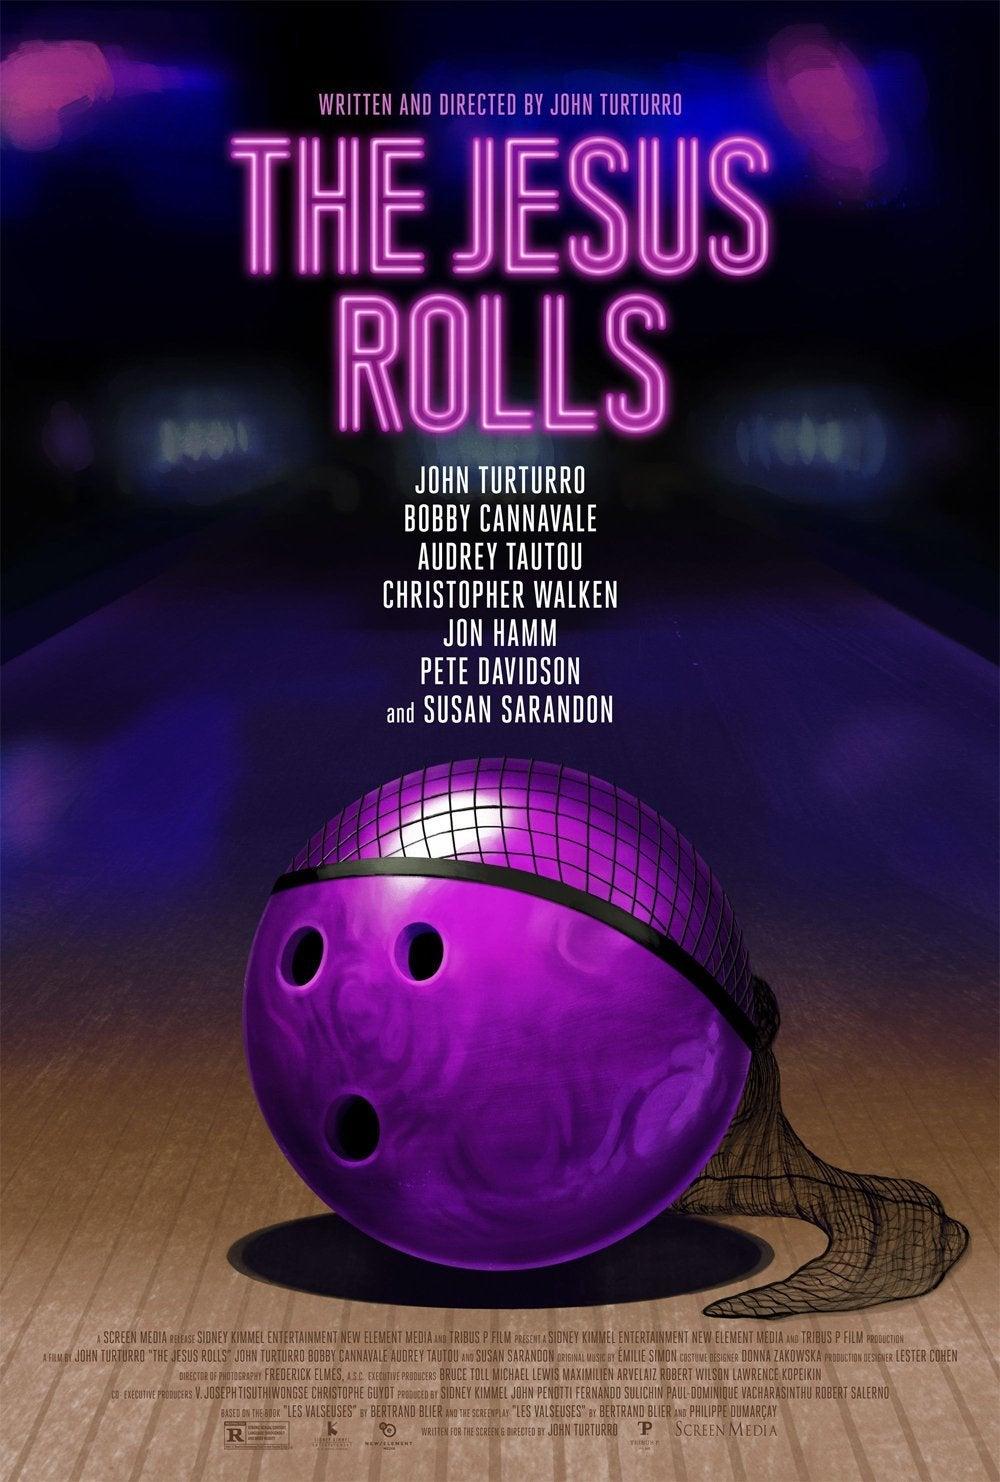 the jesus rolls poster john turturro teaser